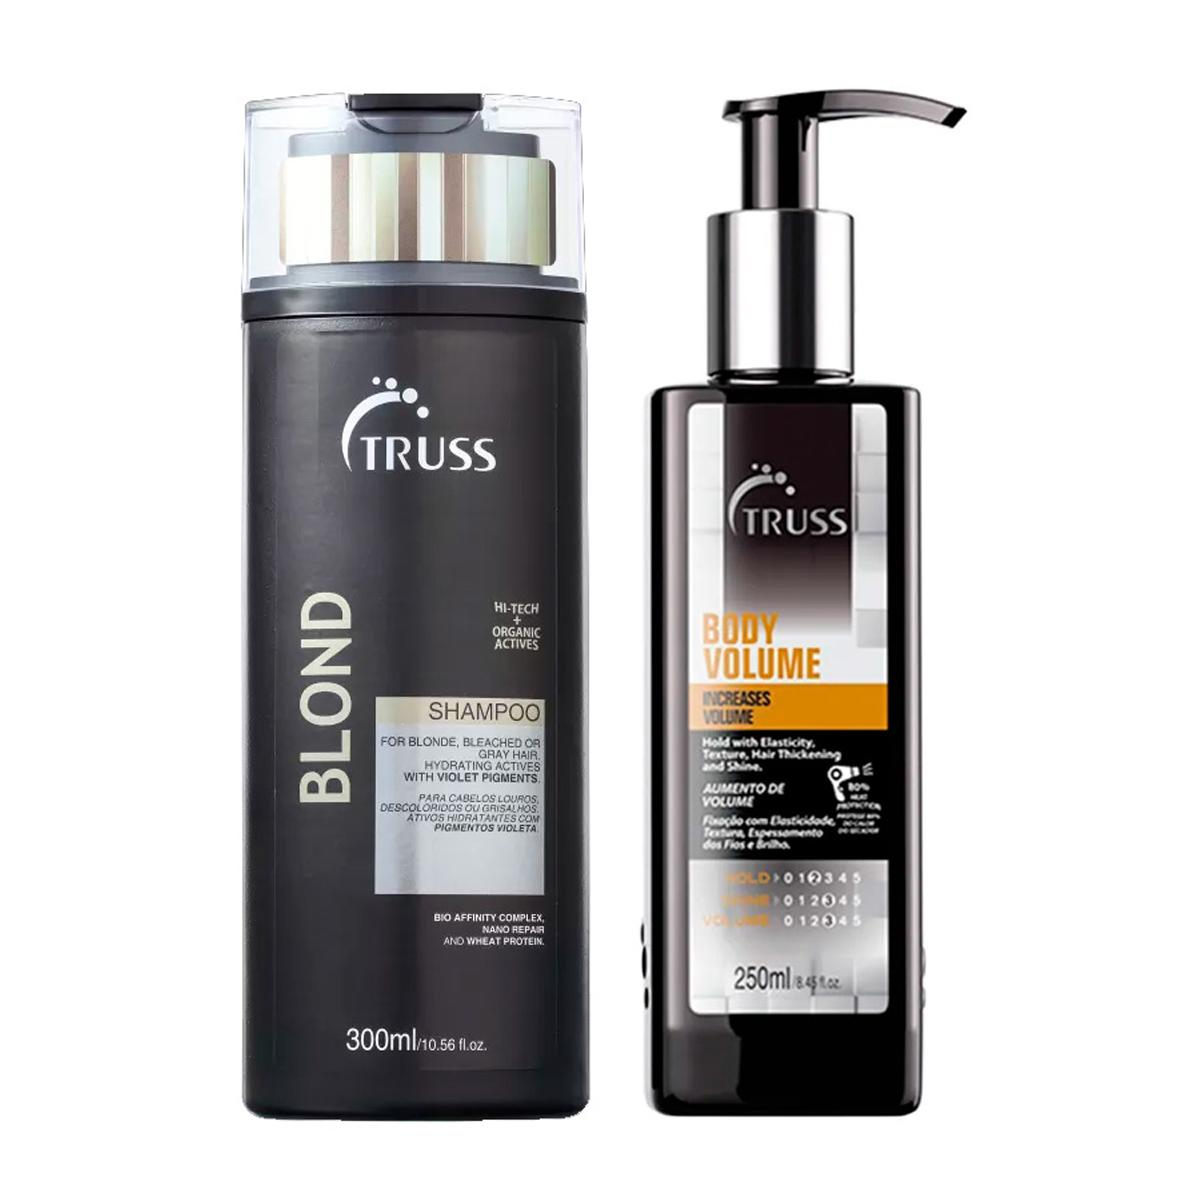 Kit Truss Blond Shampoo 300ml e Body Volume 250ml